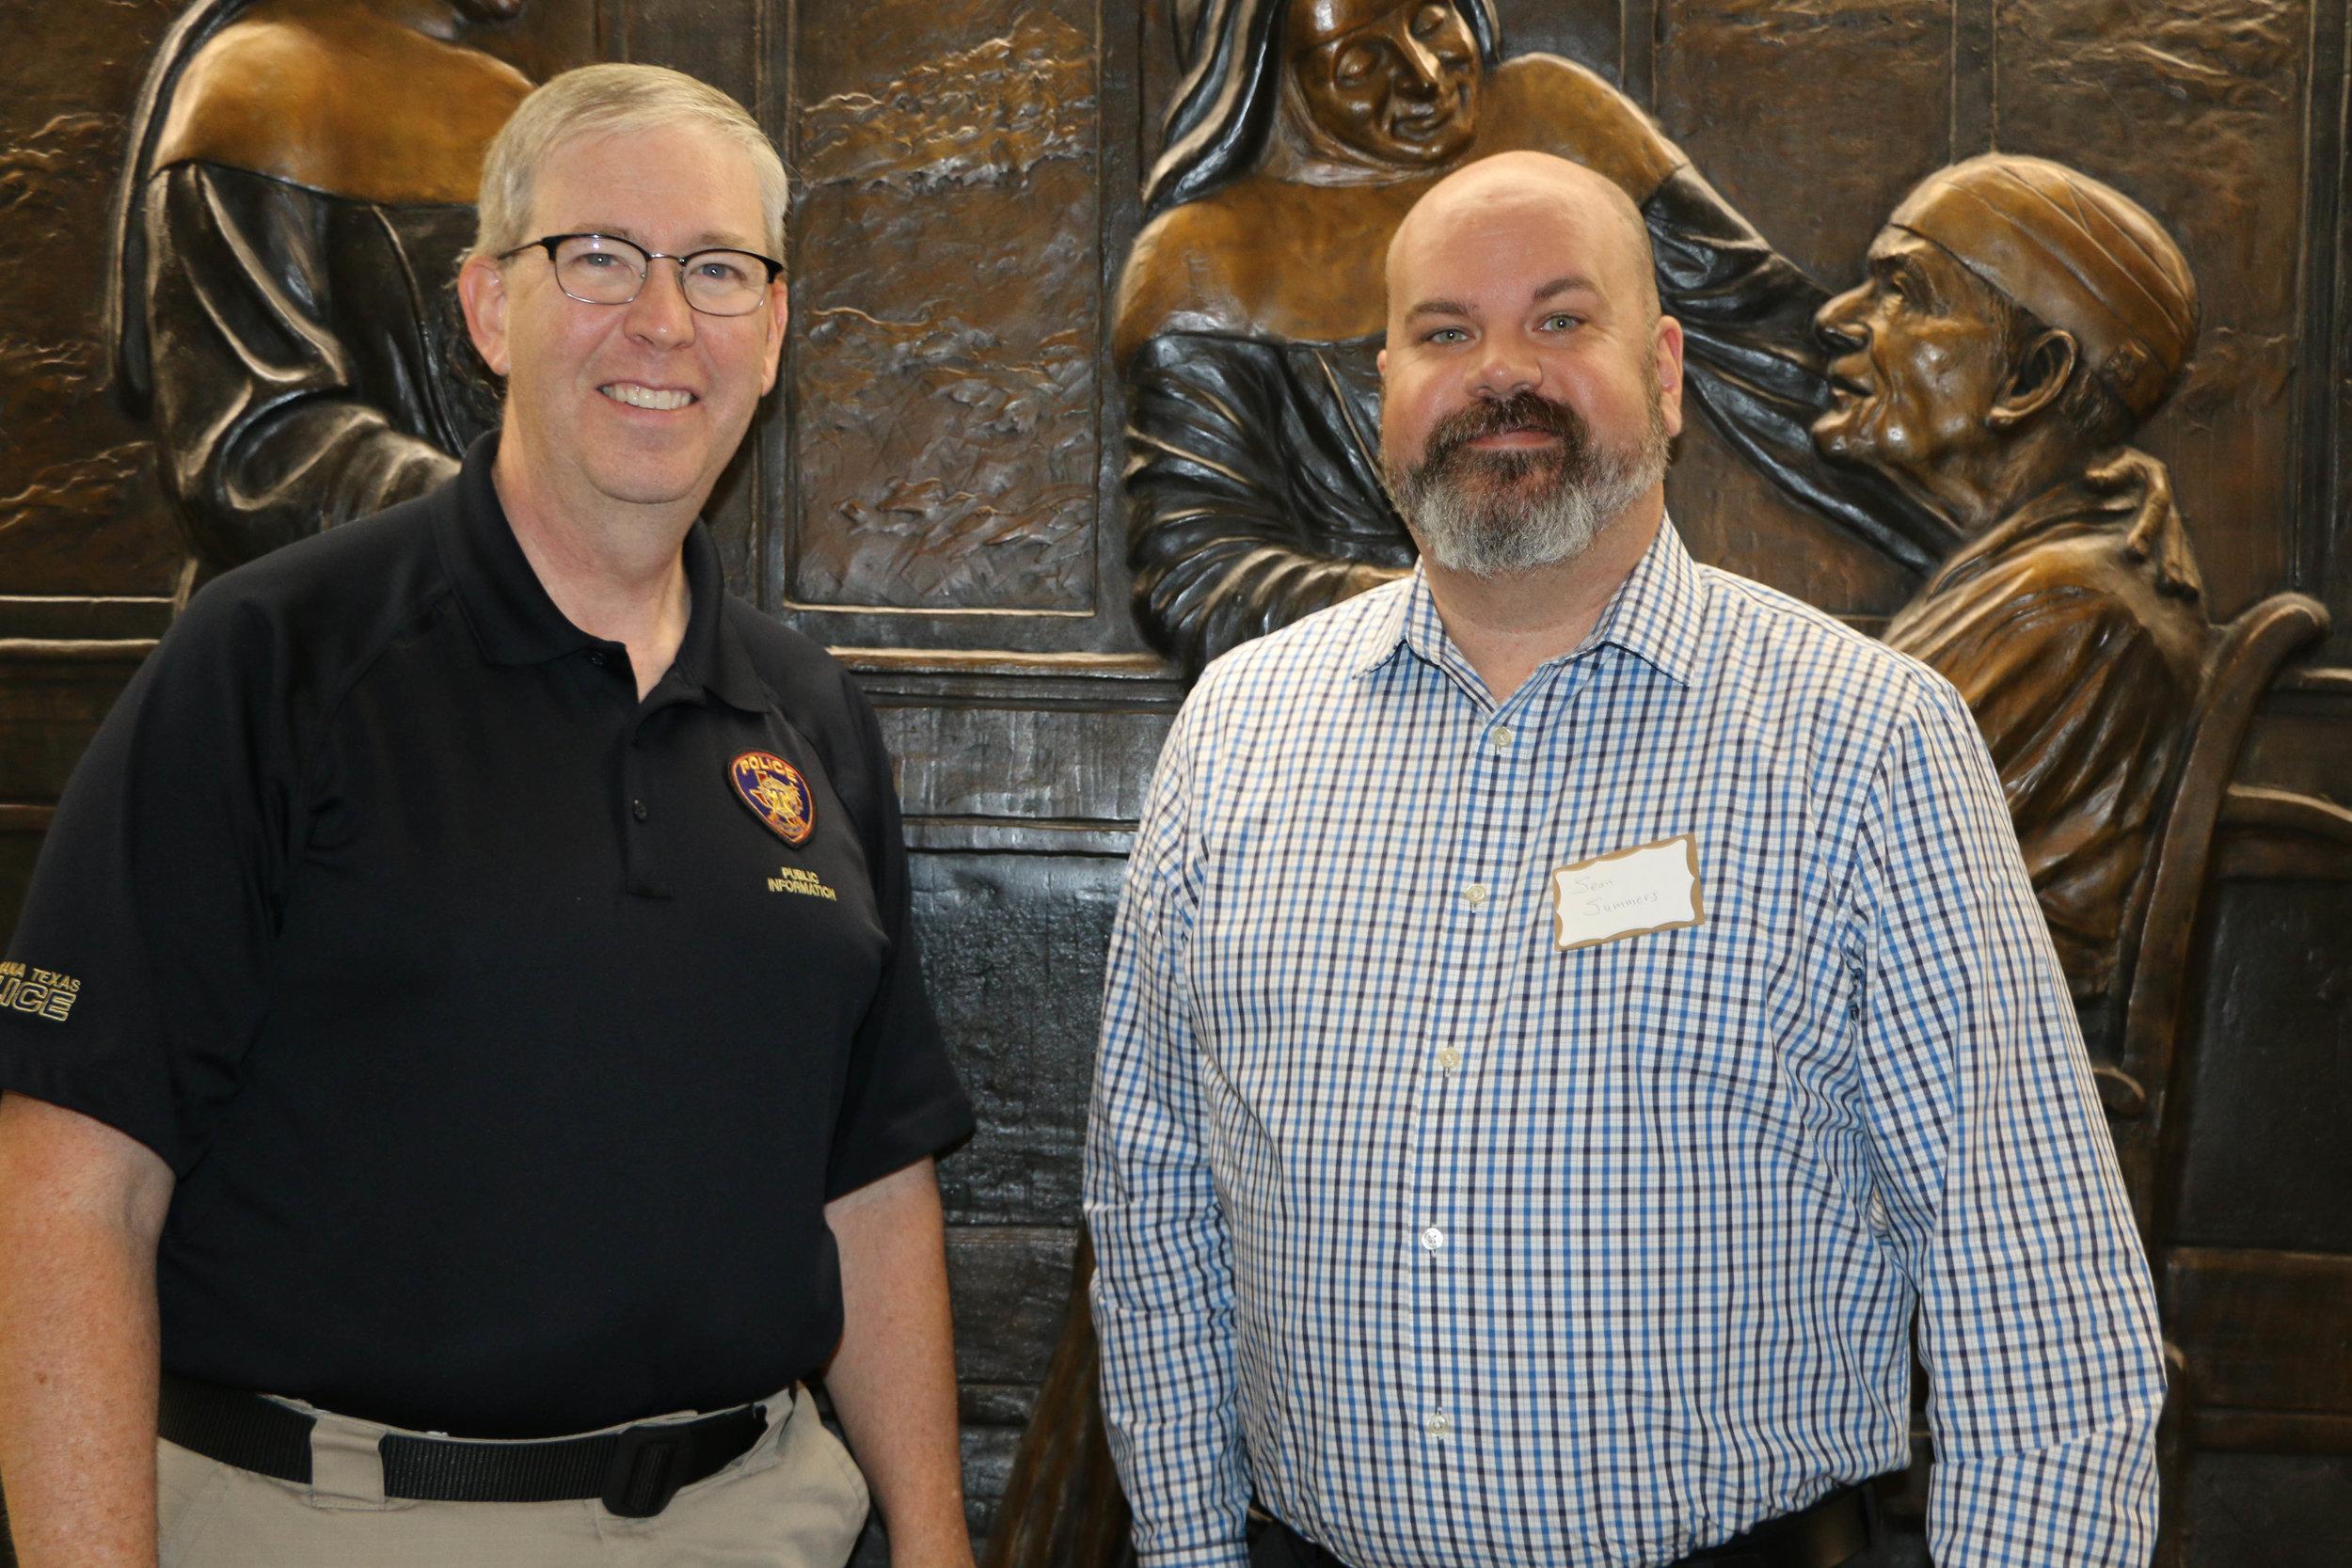 Shawn Vaughn and Dr. Sean Summers